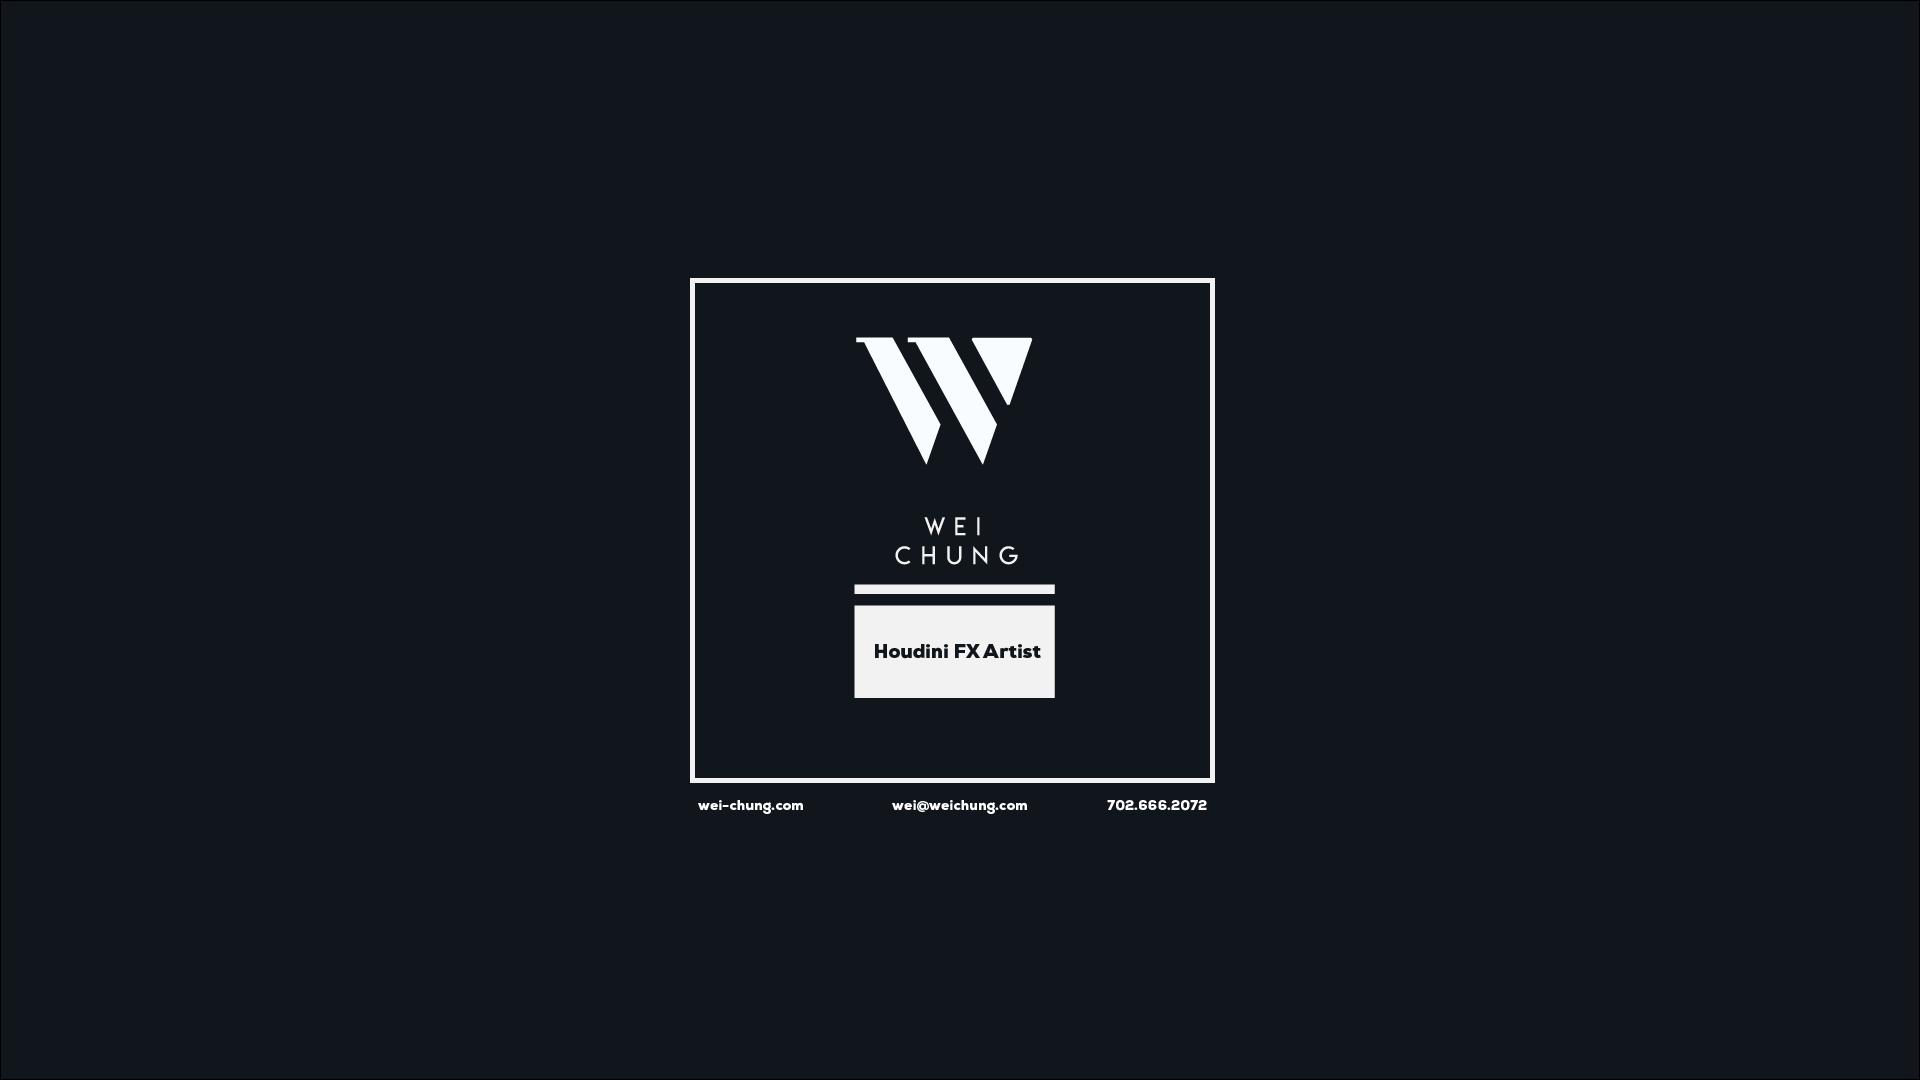 WeiChung_Branding_001-01.png